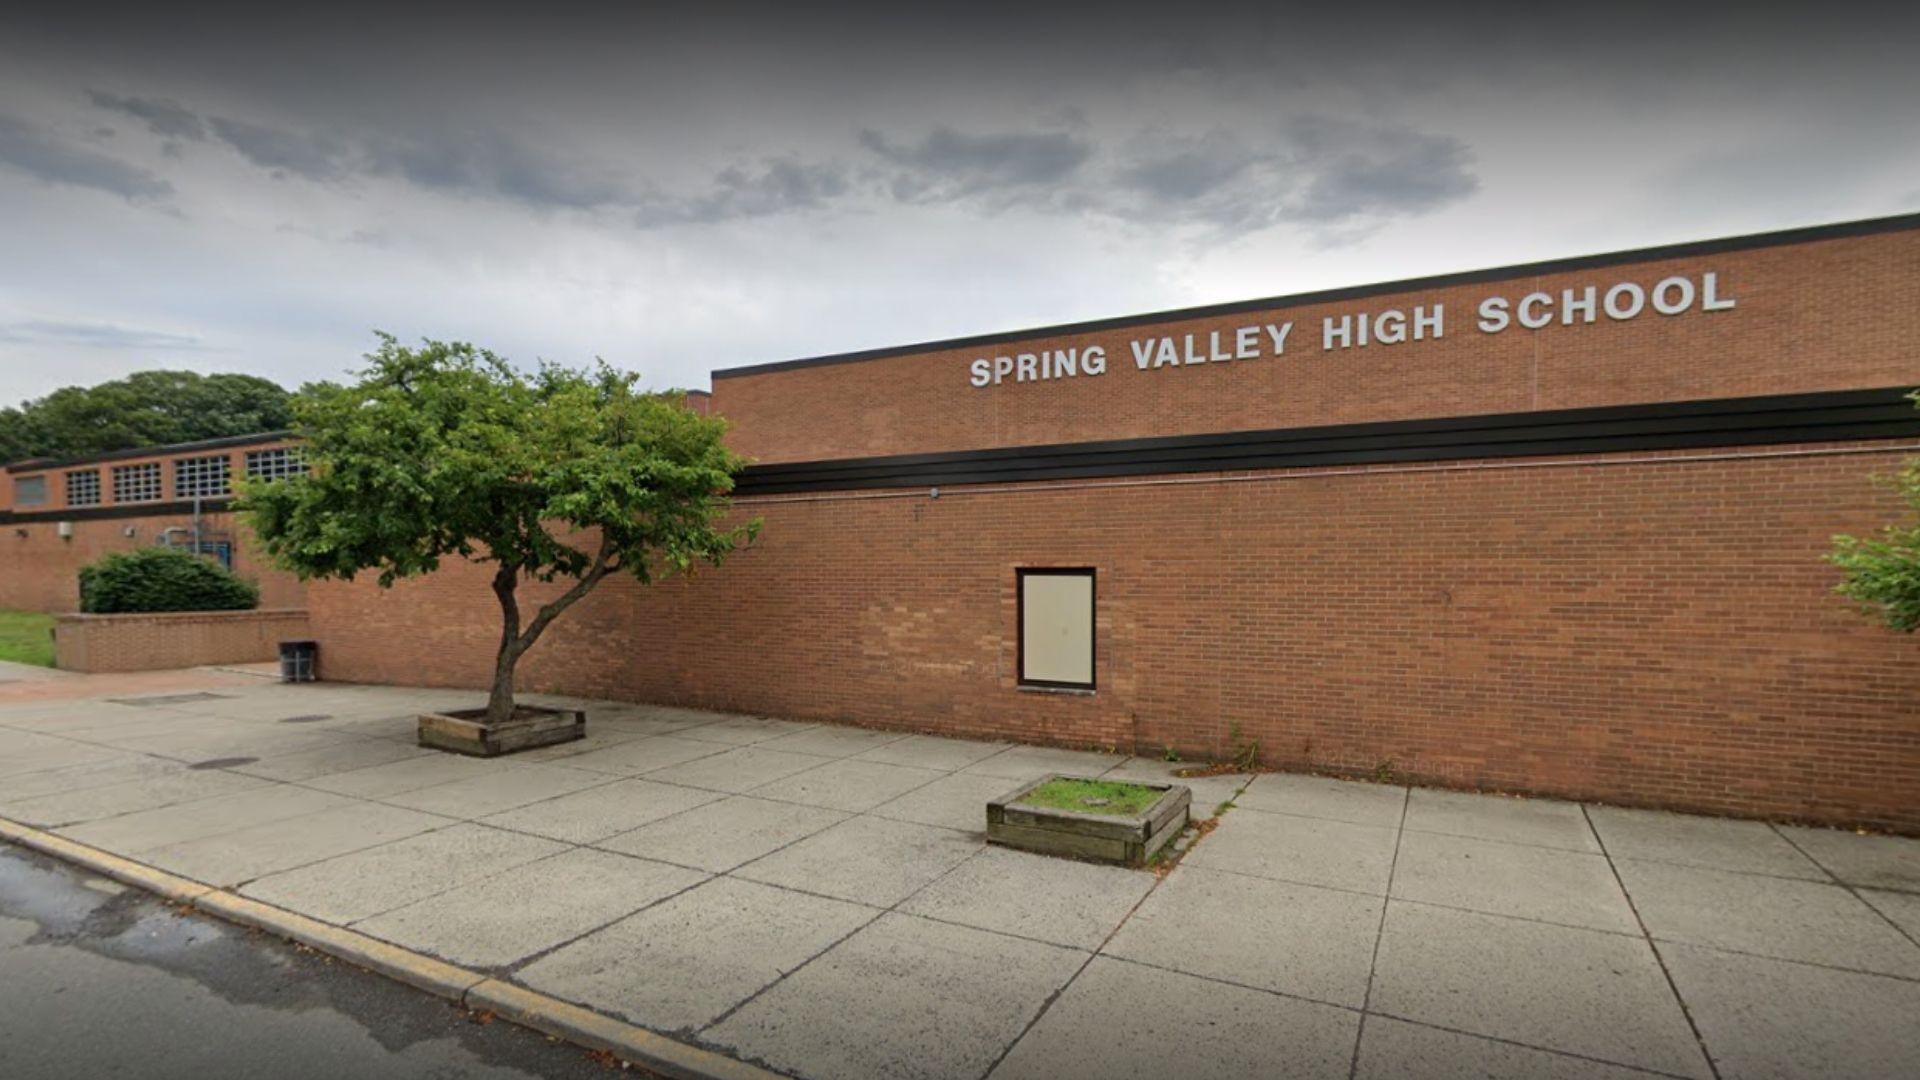 Spring Valley High School